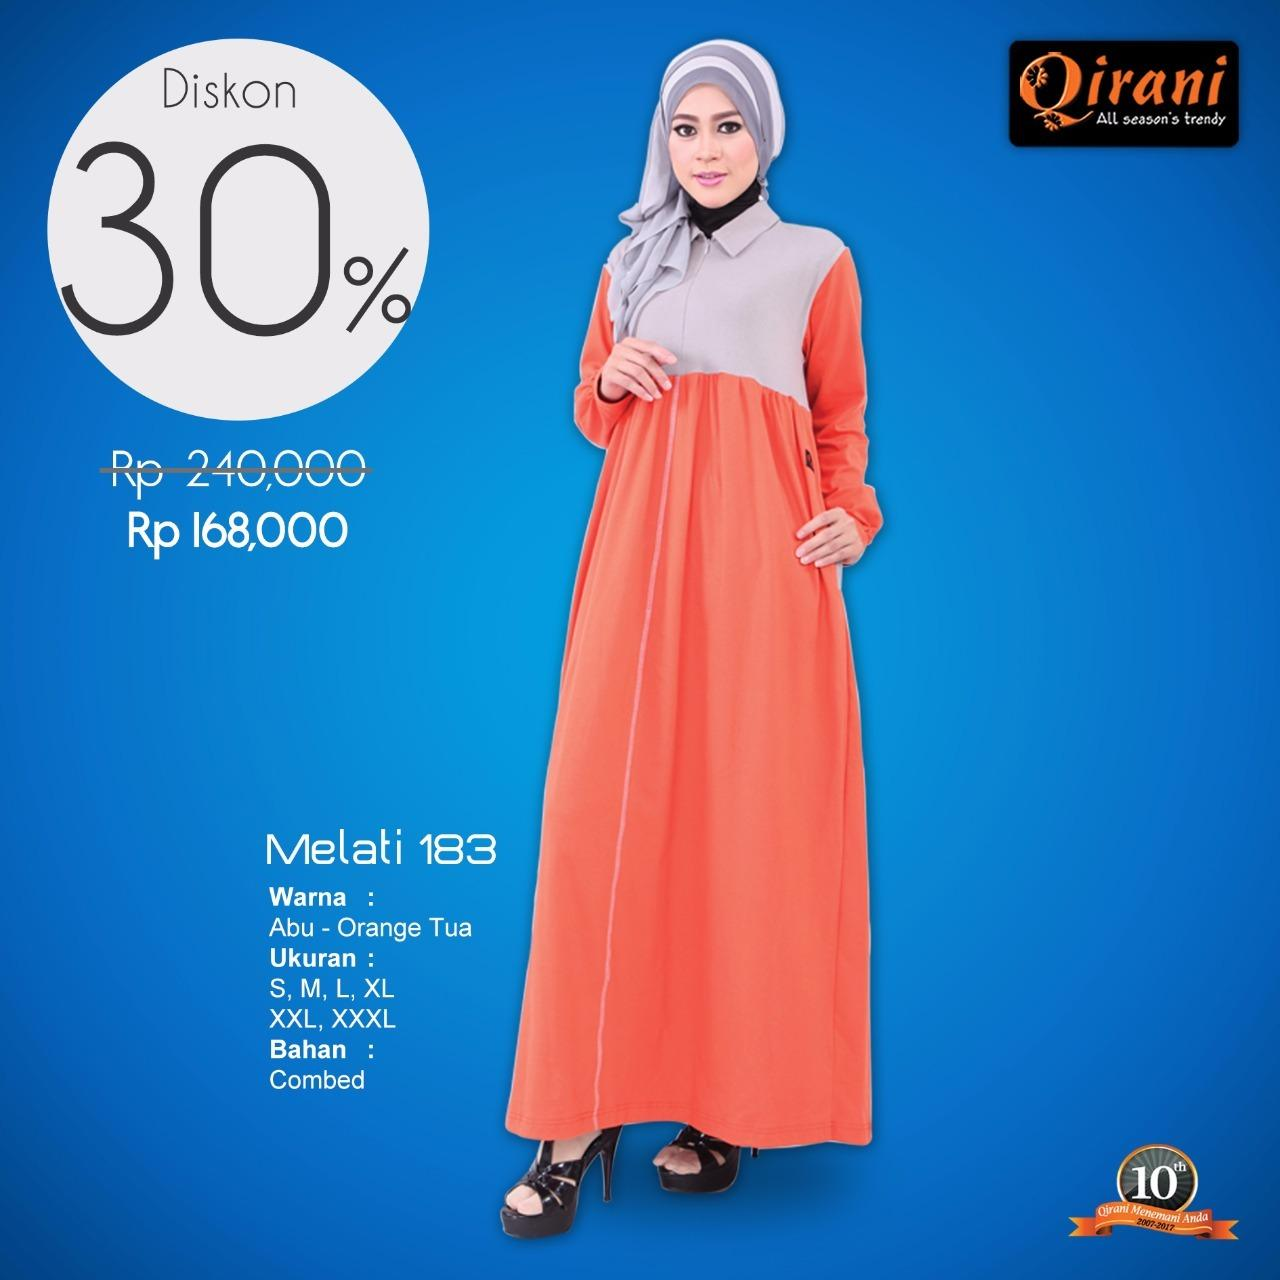 Gamis / Dress Wanita Qirani Promo Melati 183 Abu